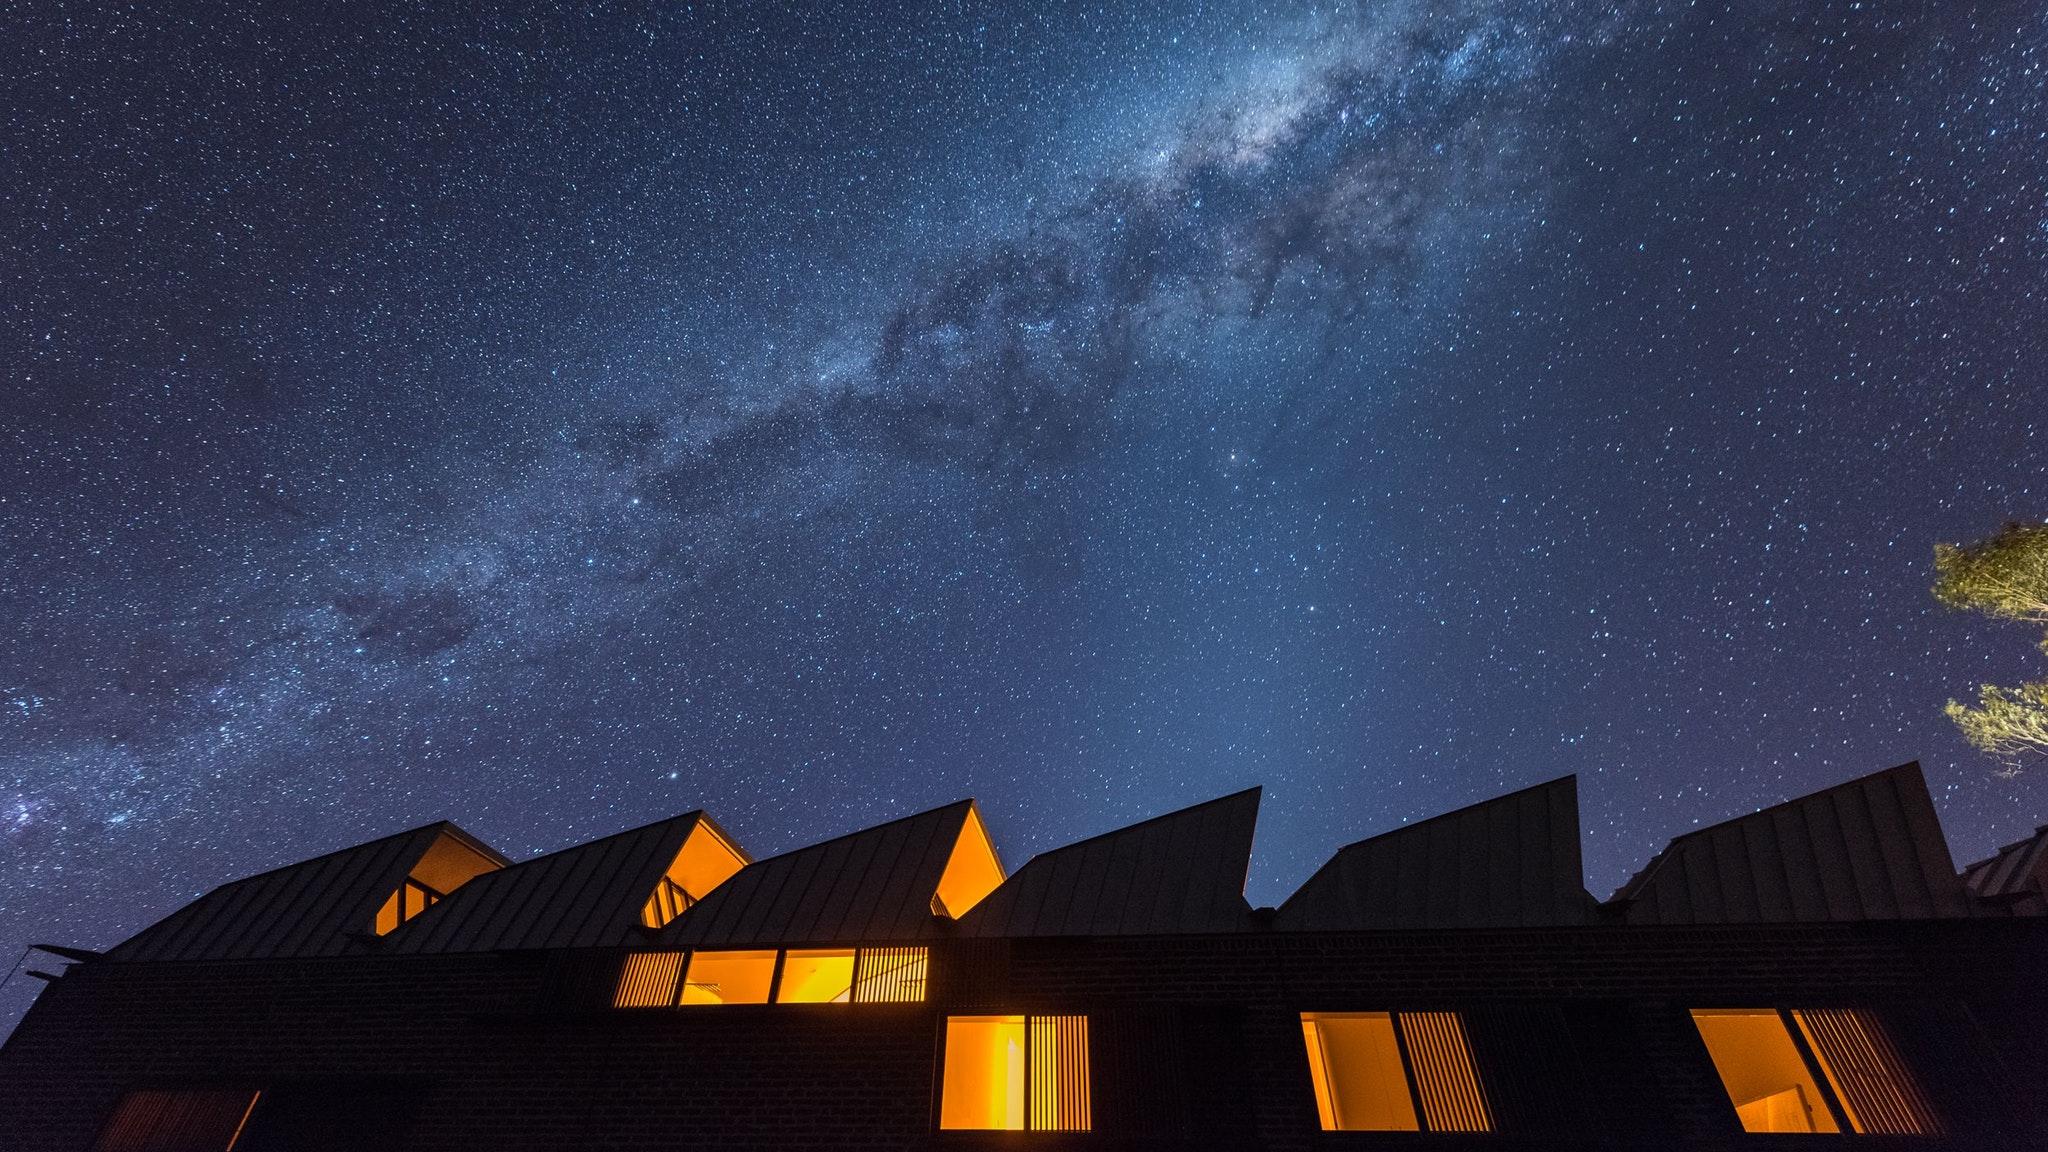 Alkina Lodge by night